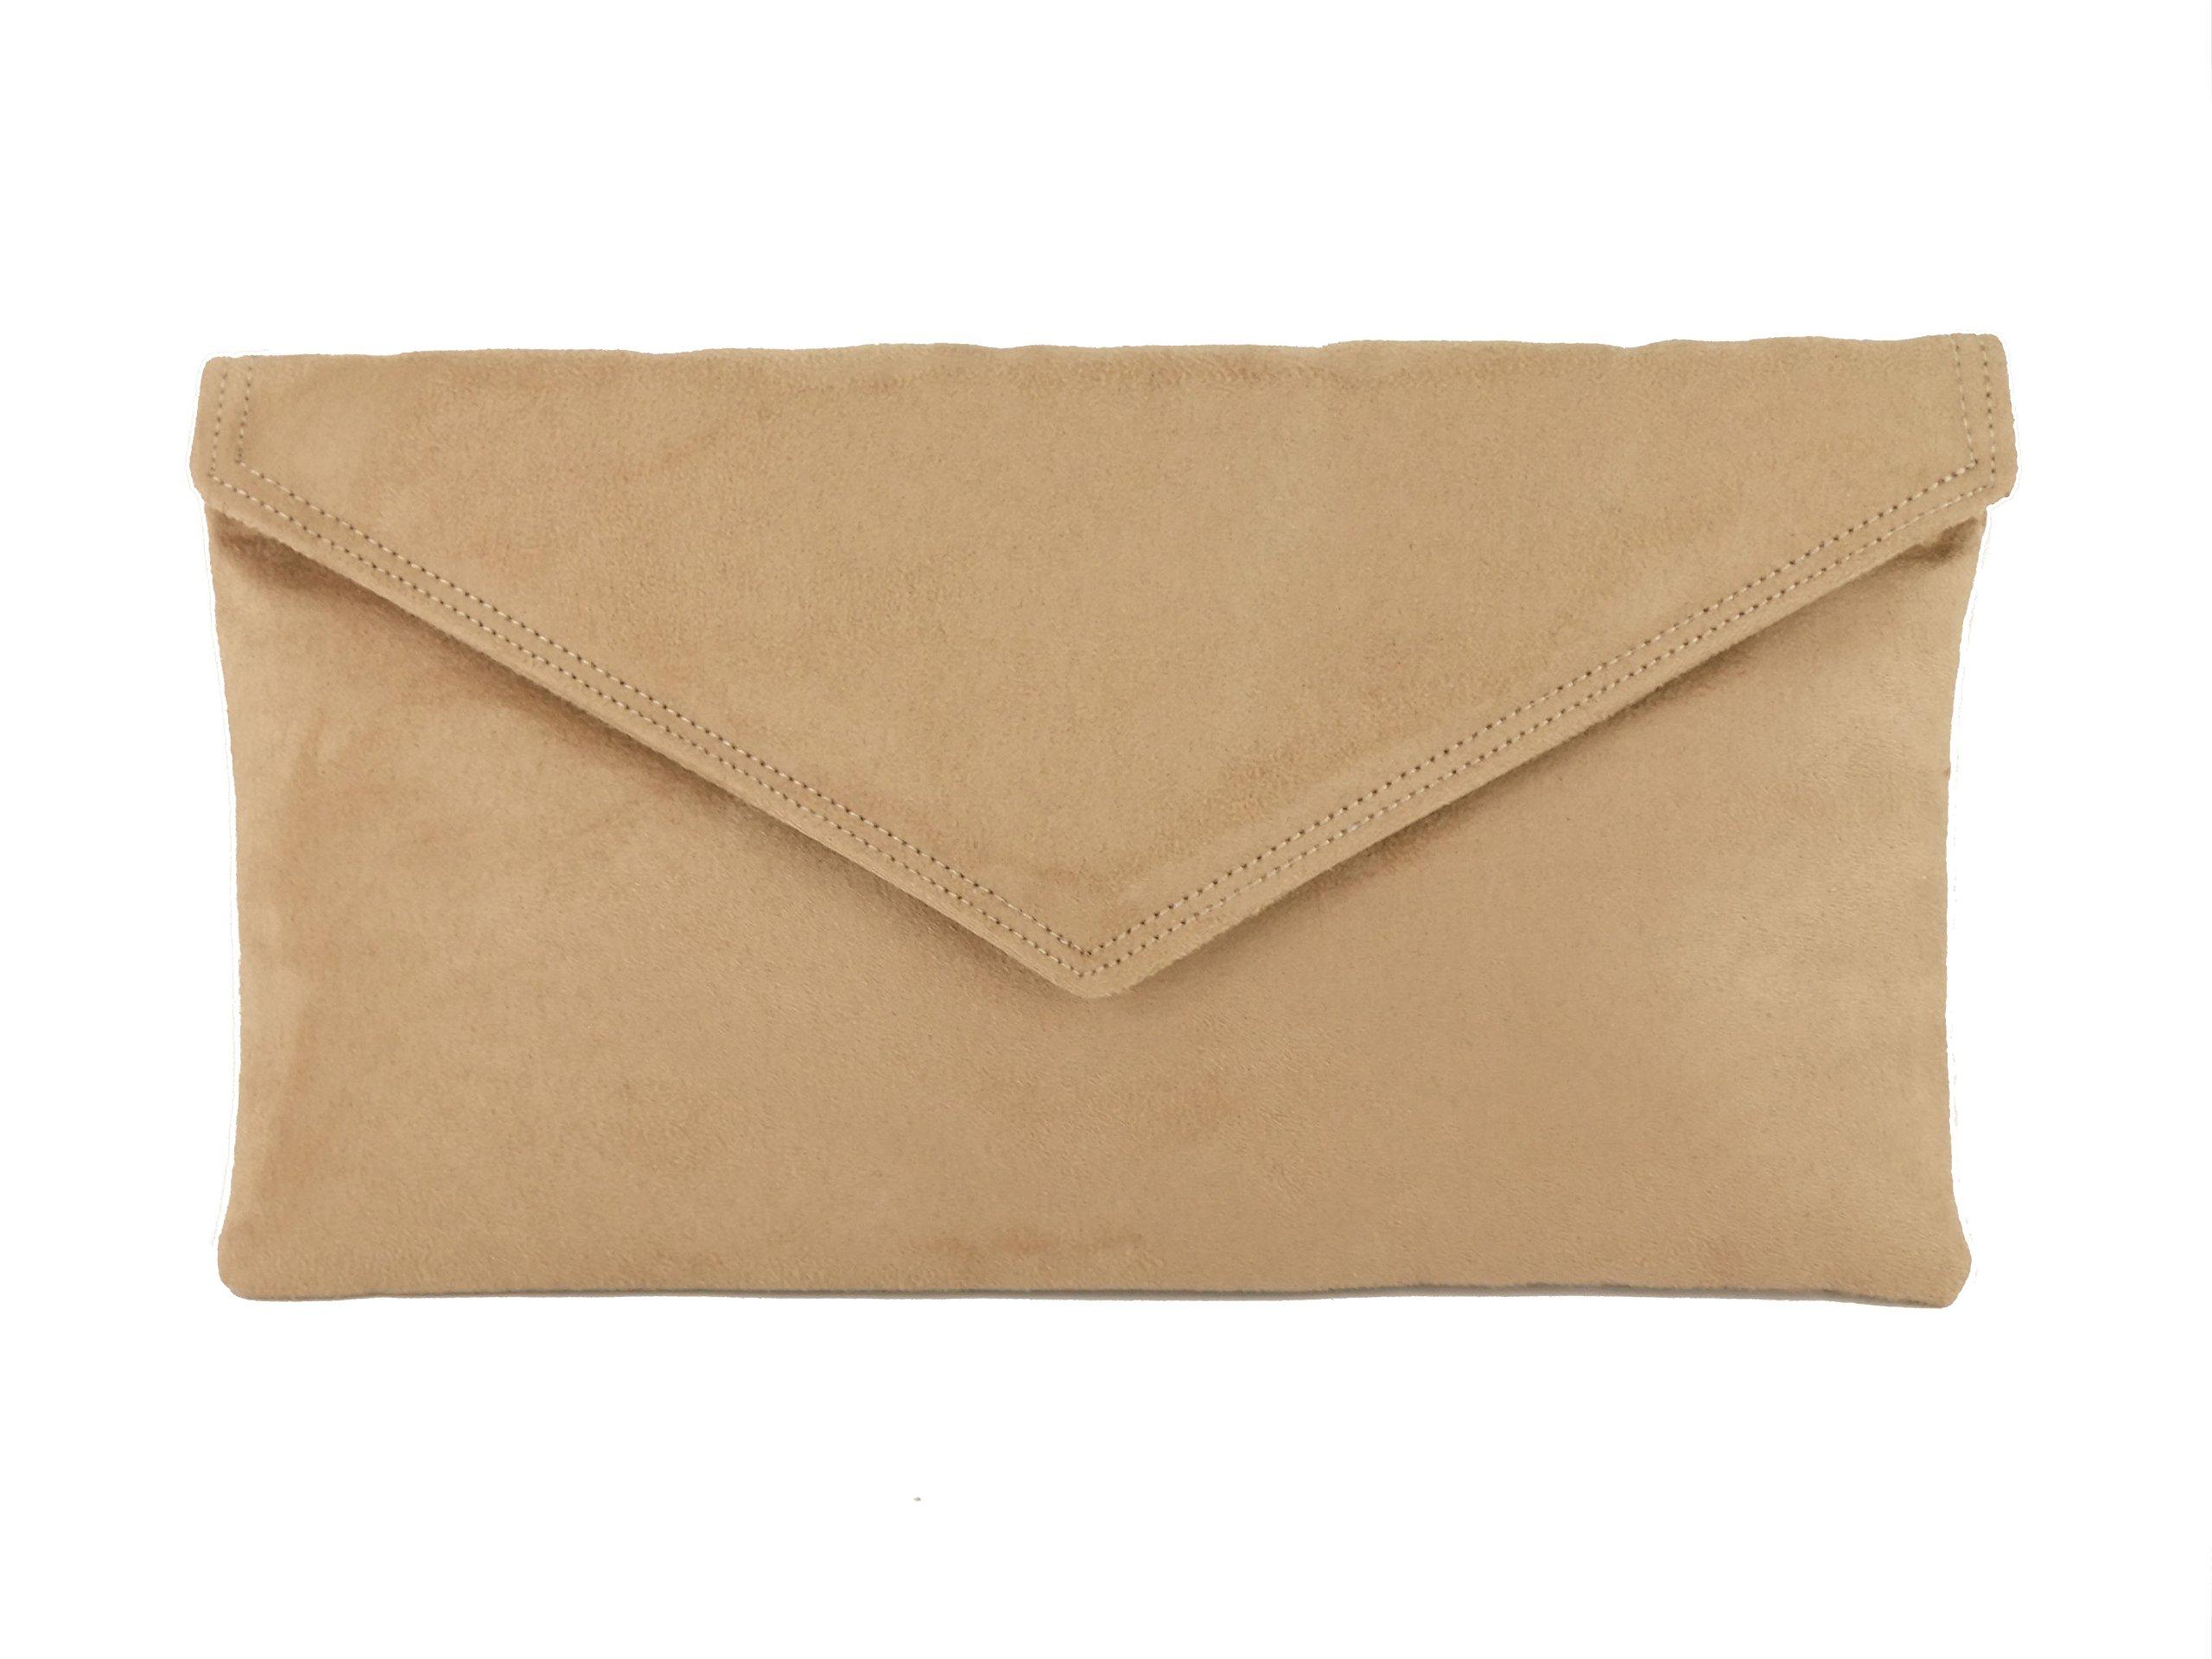 Loni Womens Neat Envelope Faux Suede Clutch Bag/Shoulder Bag in Camel Beige